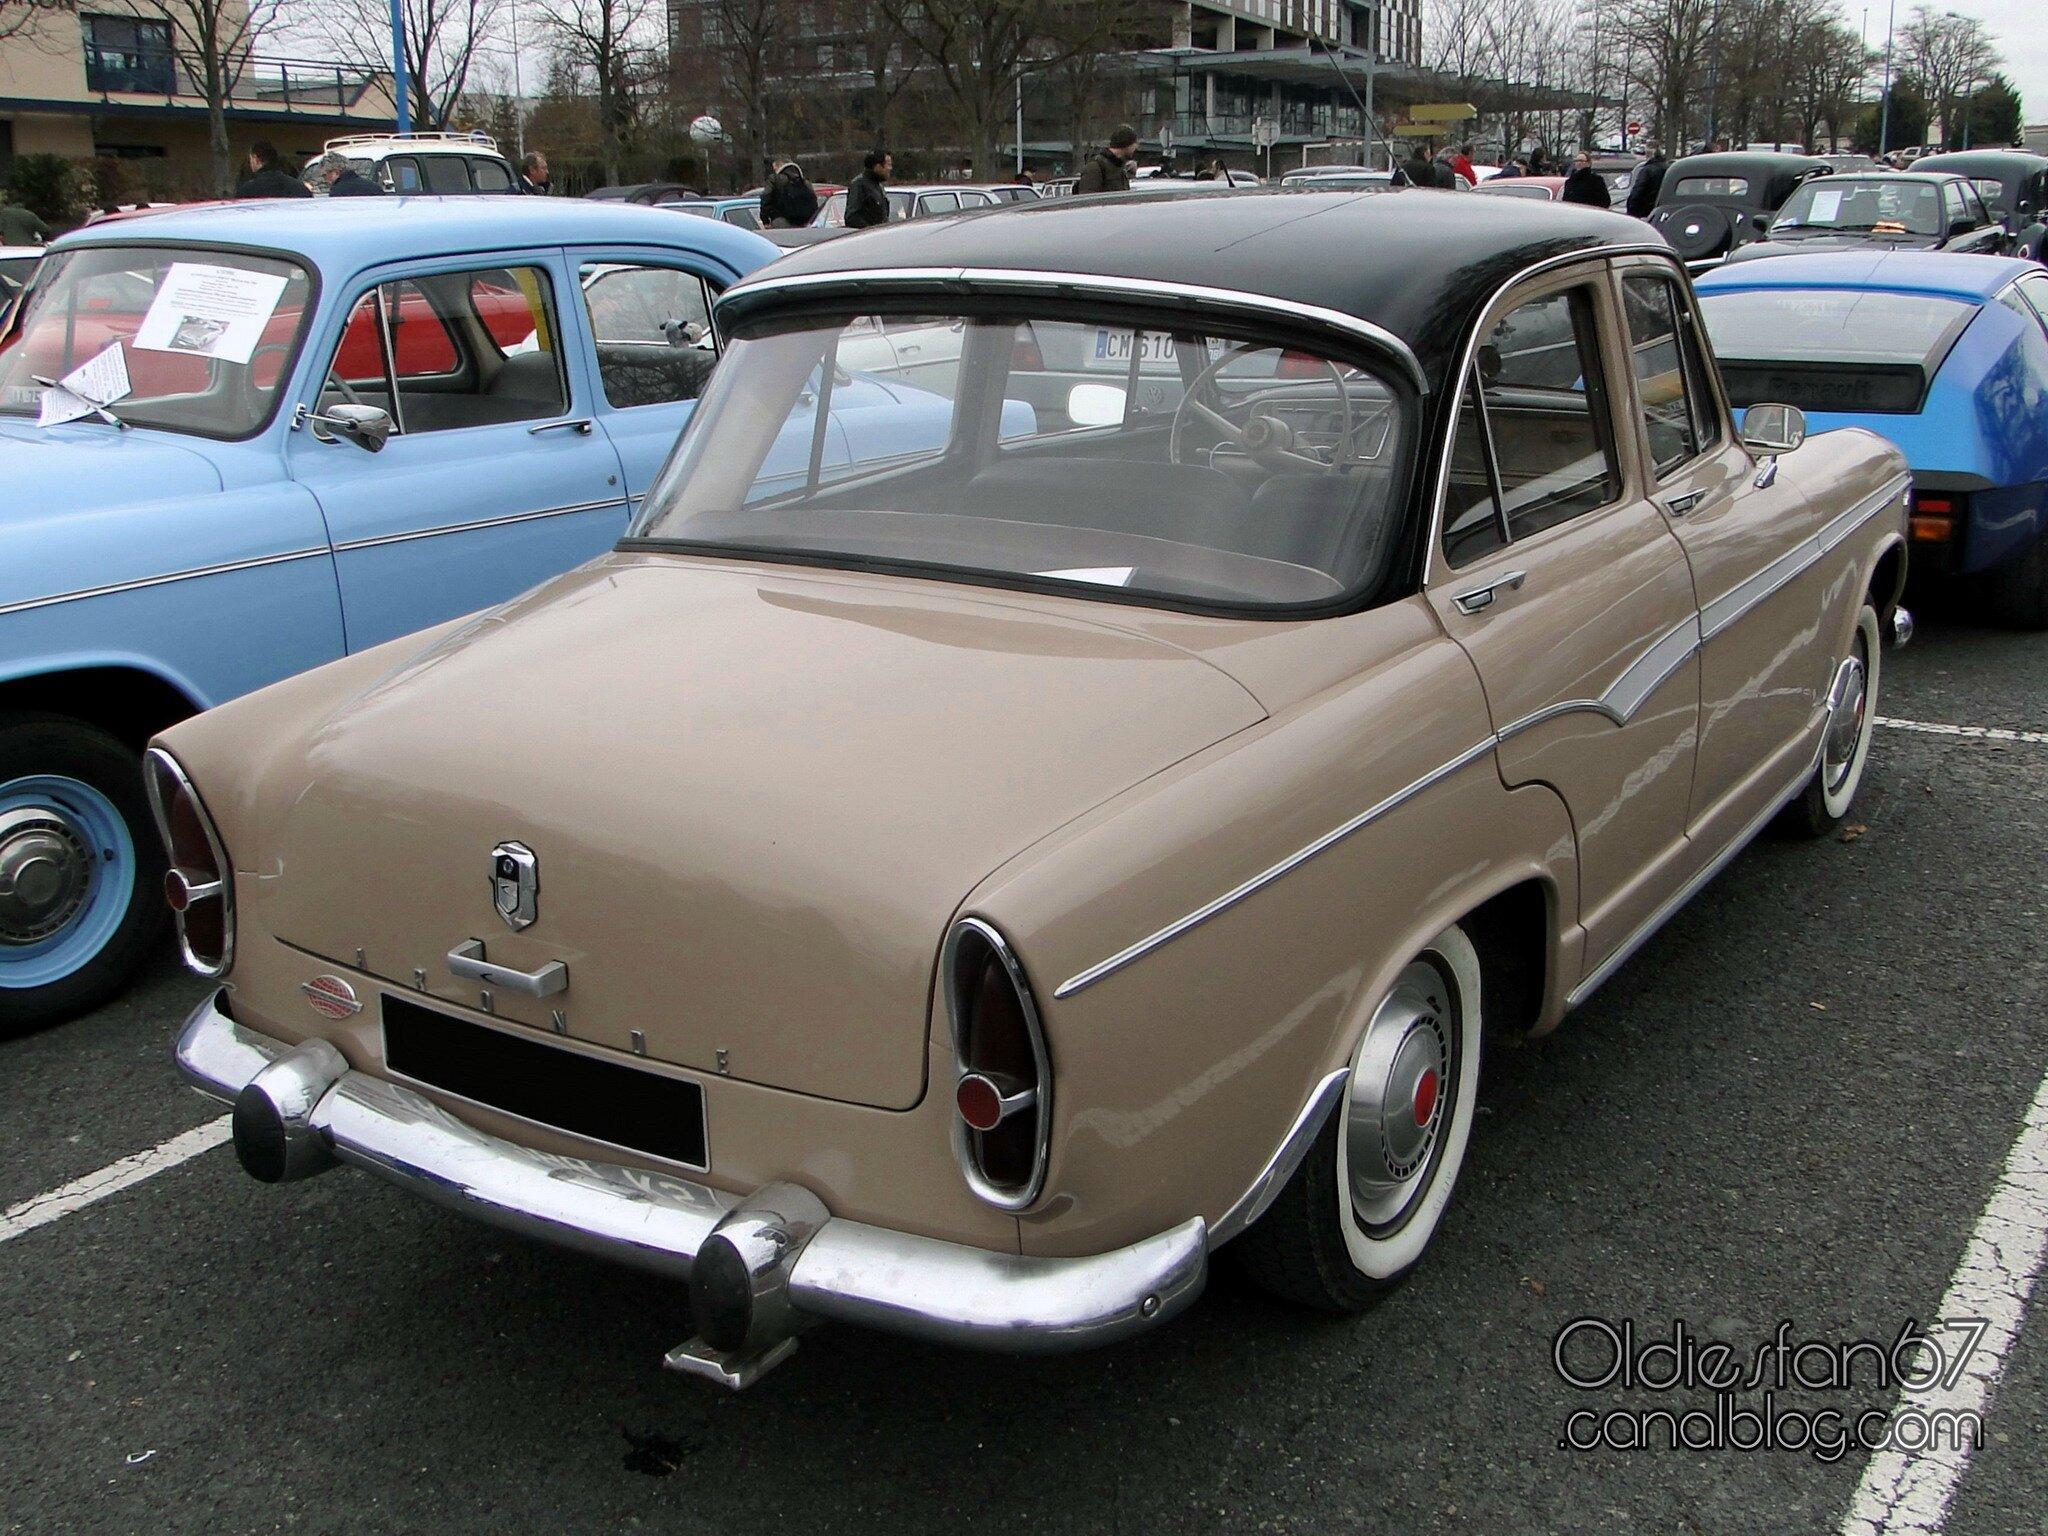 1959 Simca Aronde Sedan-green- rVl ritz-mx - Picture Gallery ...